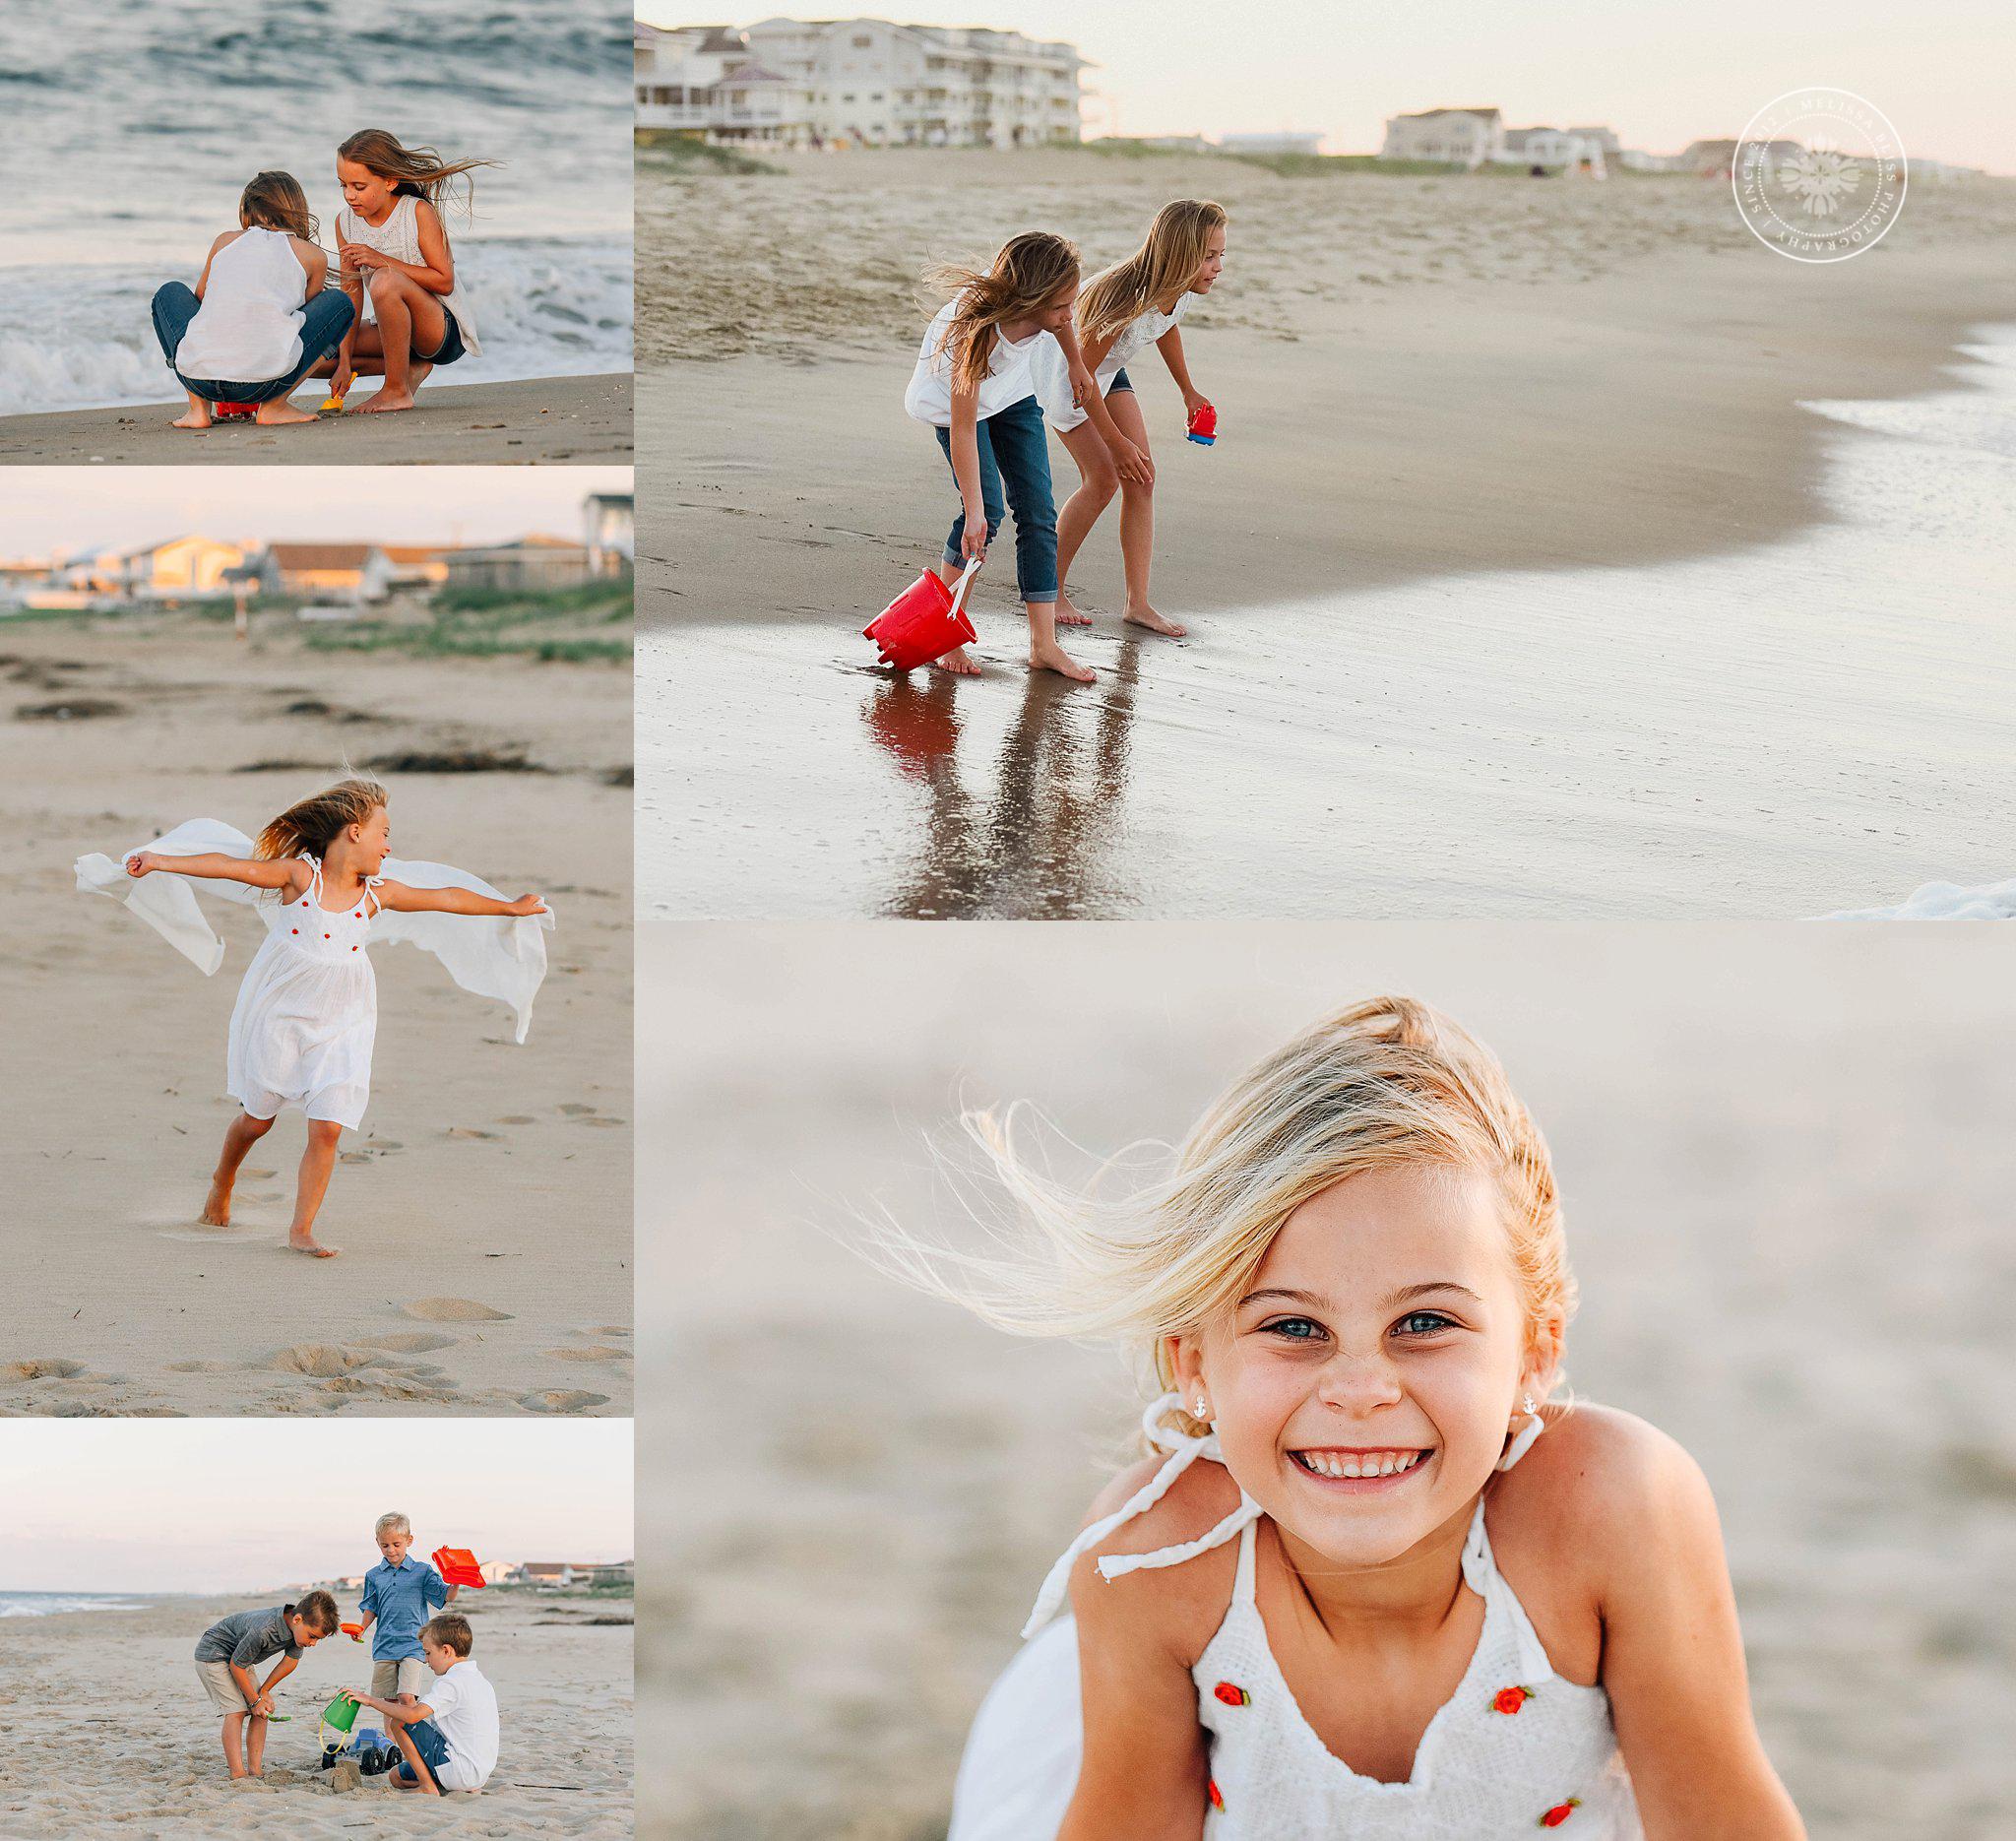 virginia-beach-photographers-sandbridge-beach-family-photo-session-melissa-bliss-photography-norfolk-portsmouth-chesapeake.jpg